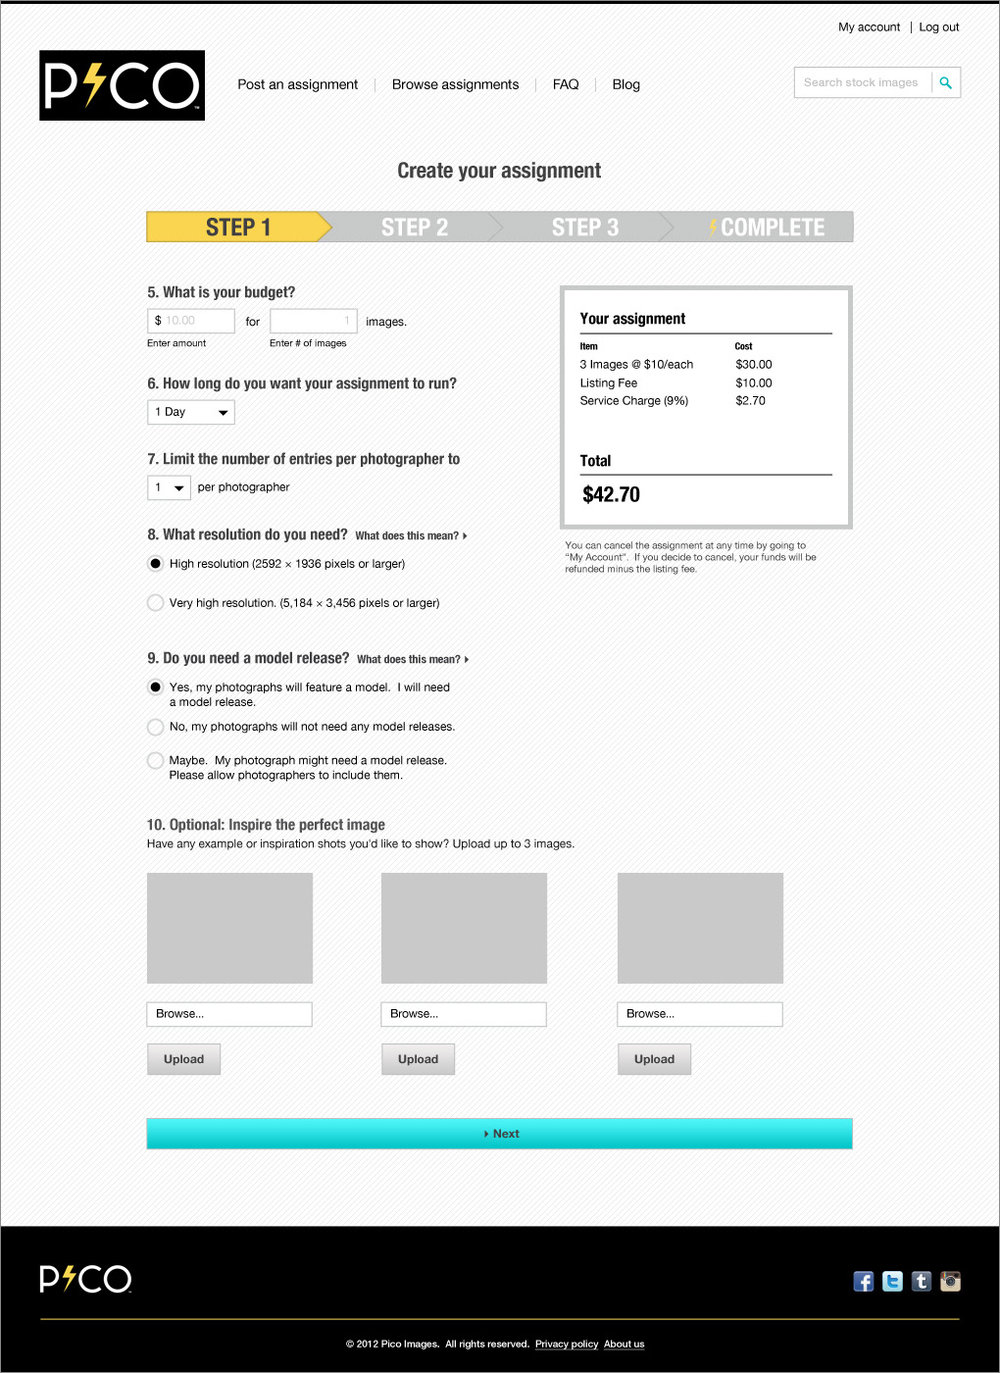 Buyers create an assignment